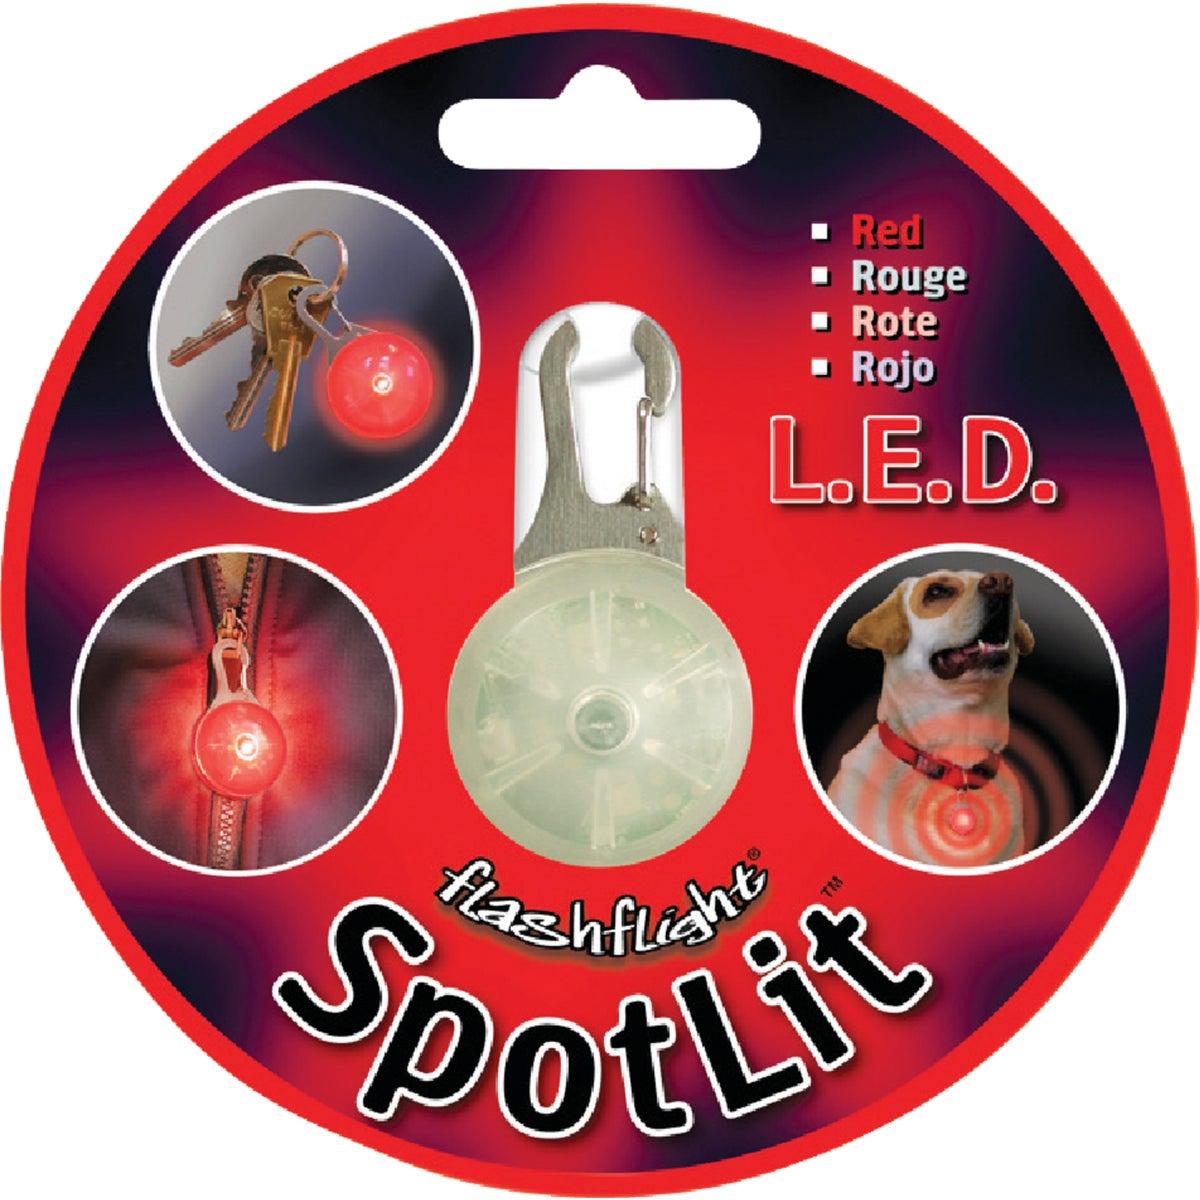 Red Spotlit